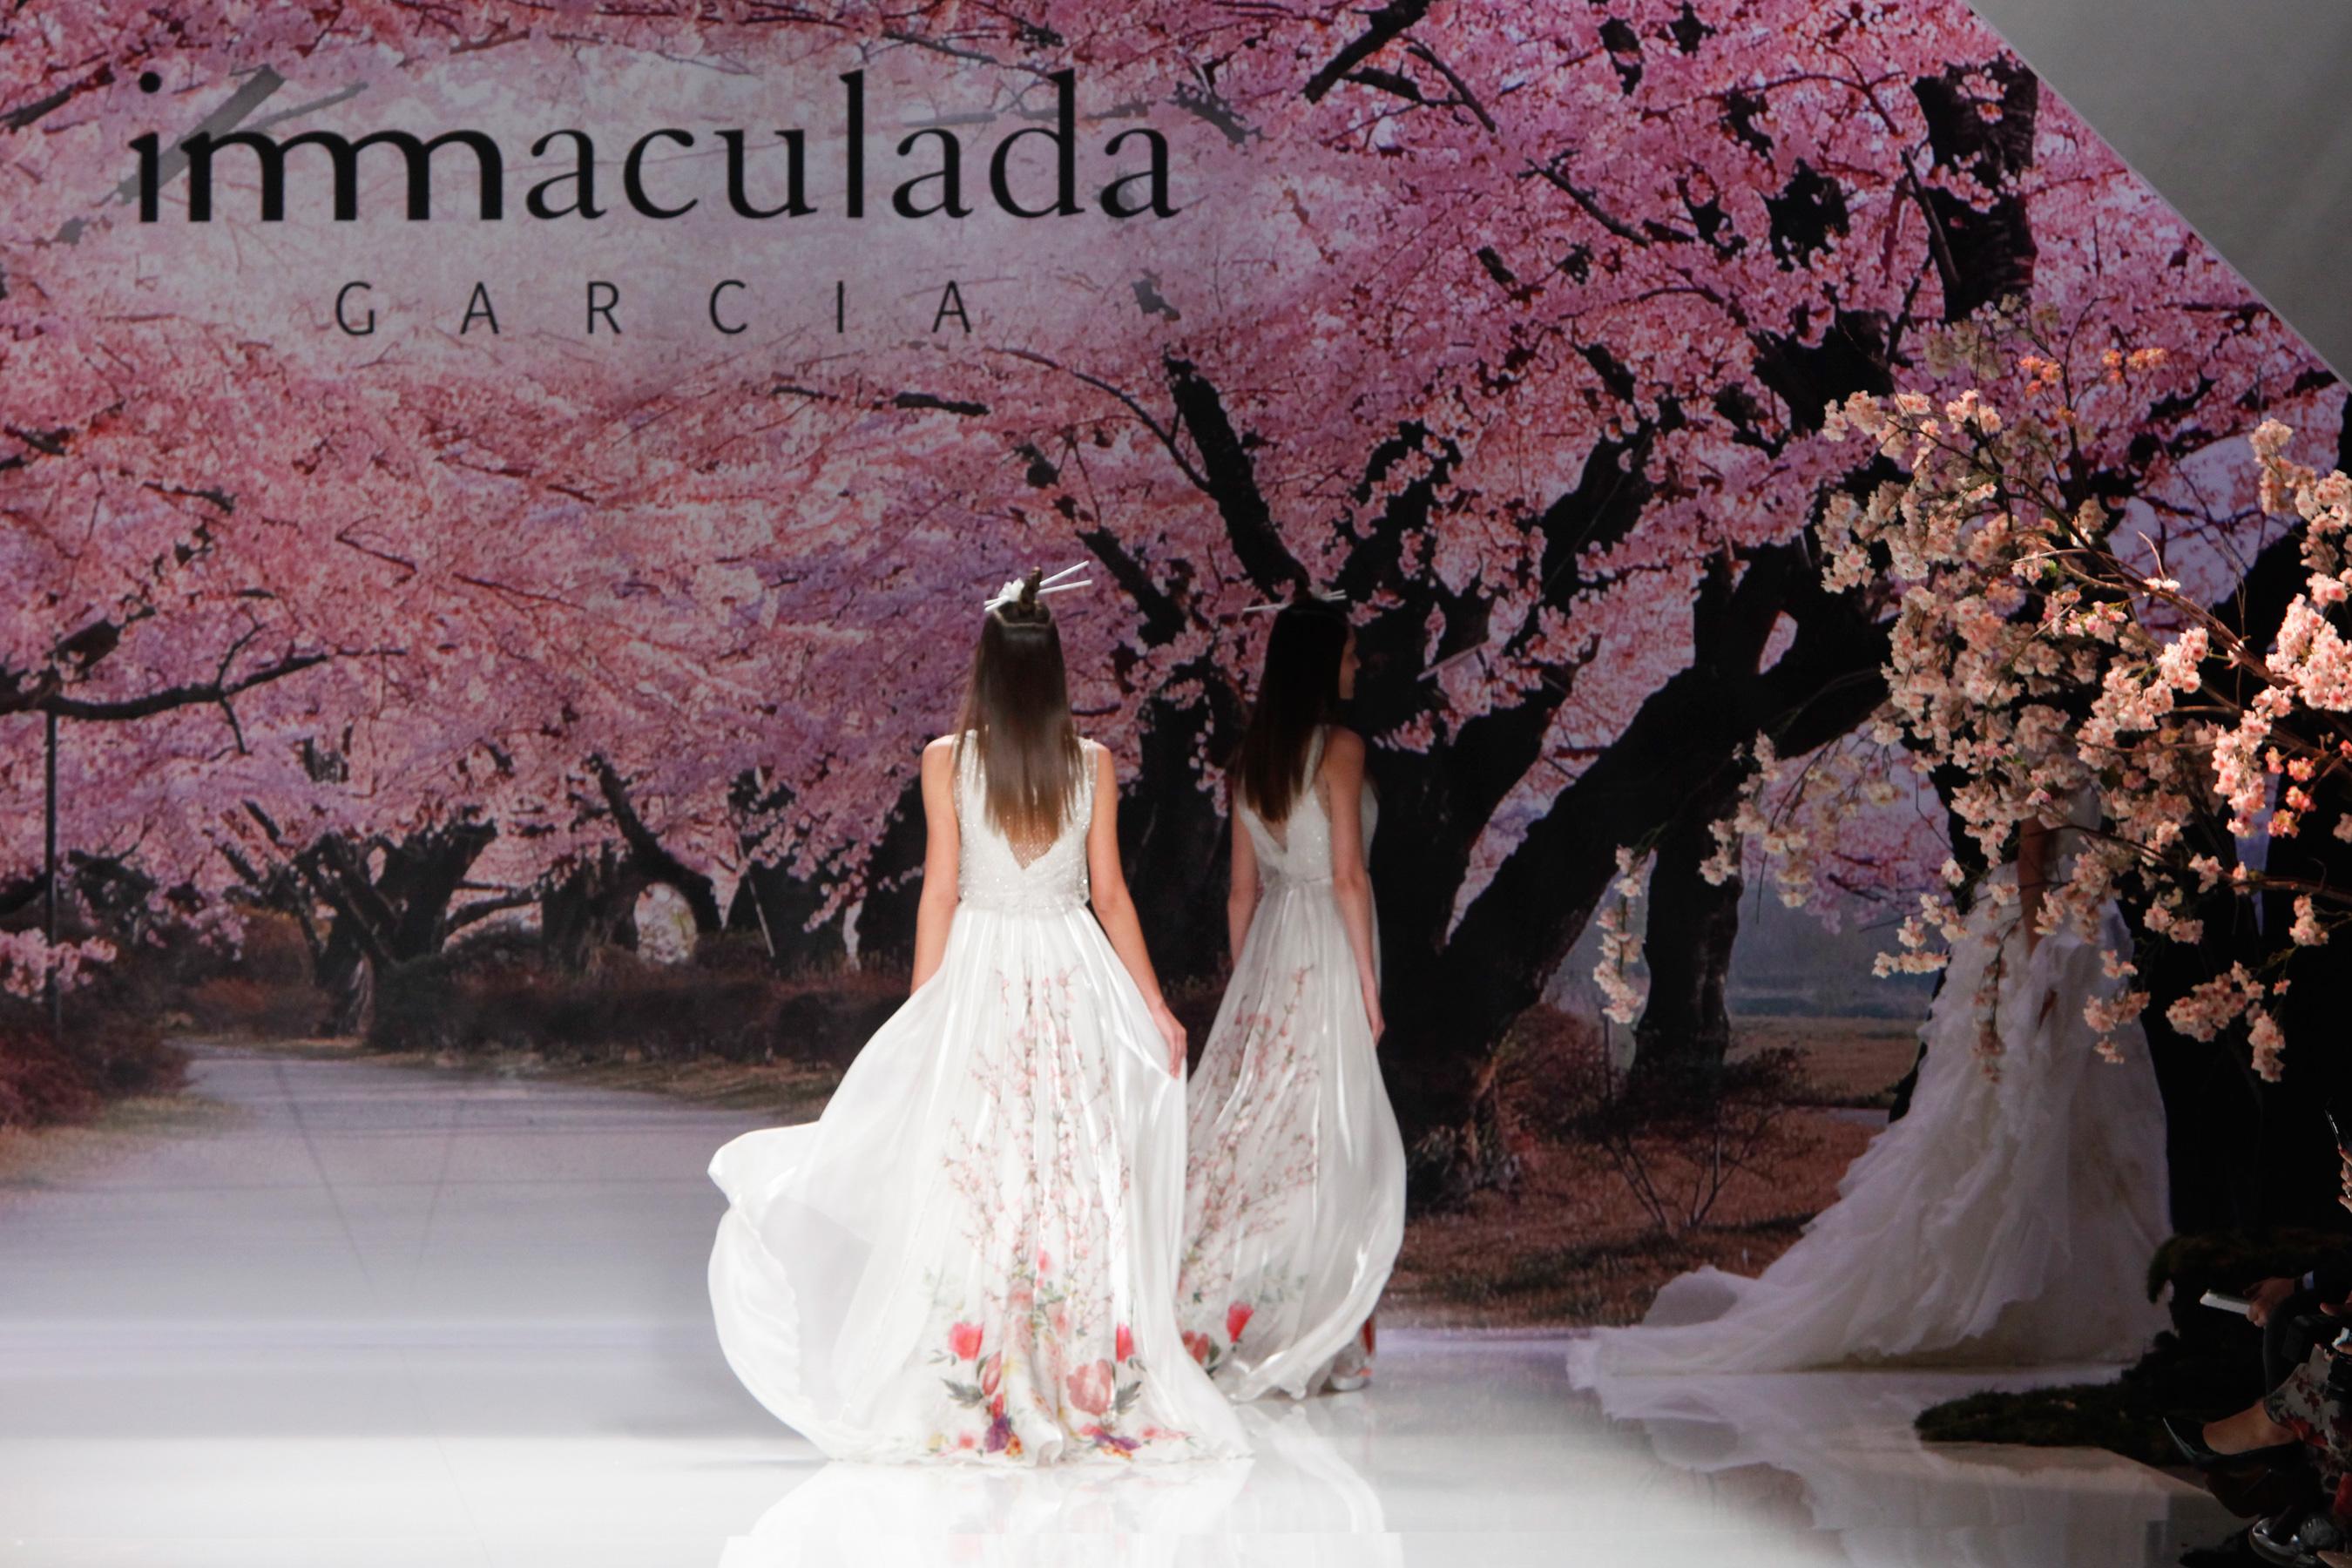 Inmaculada Garcia brd RS17 0790